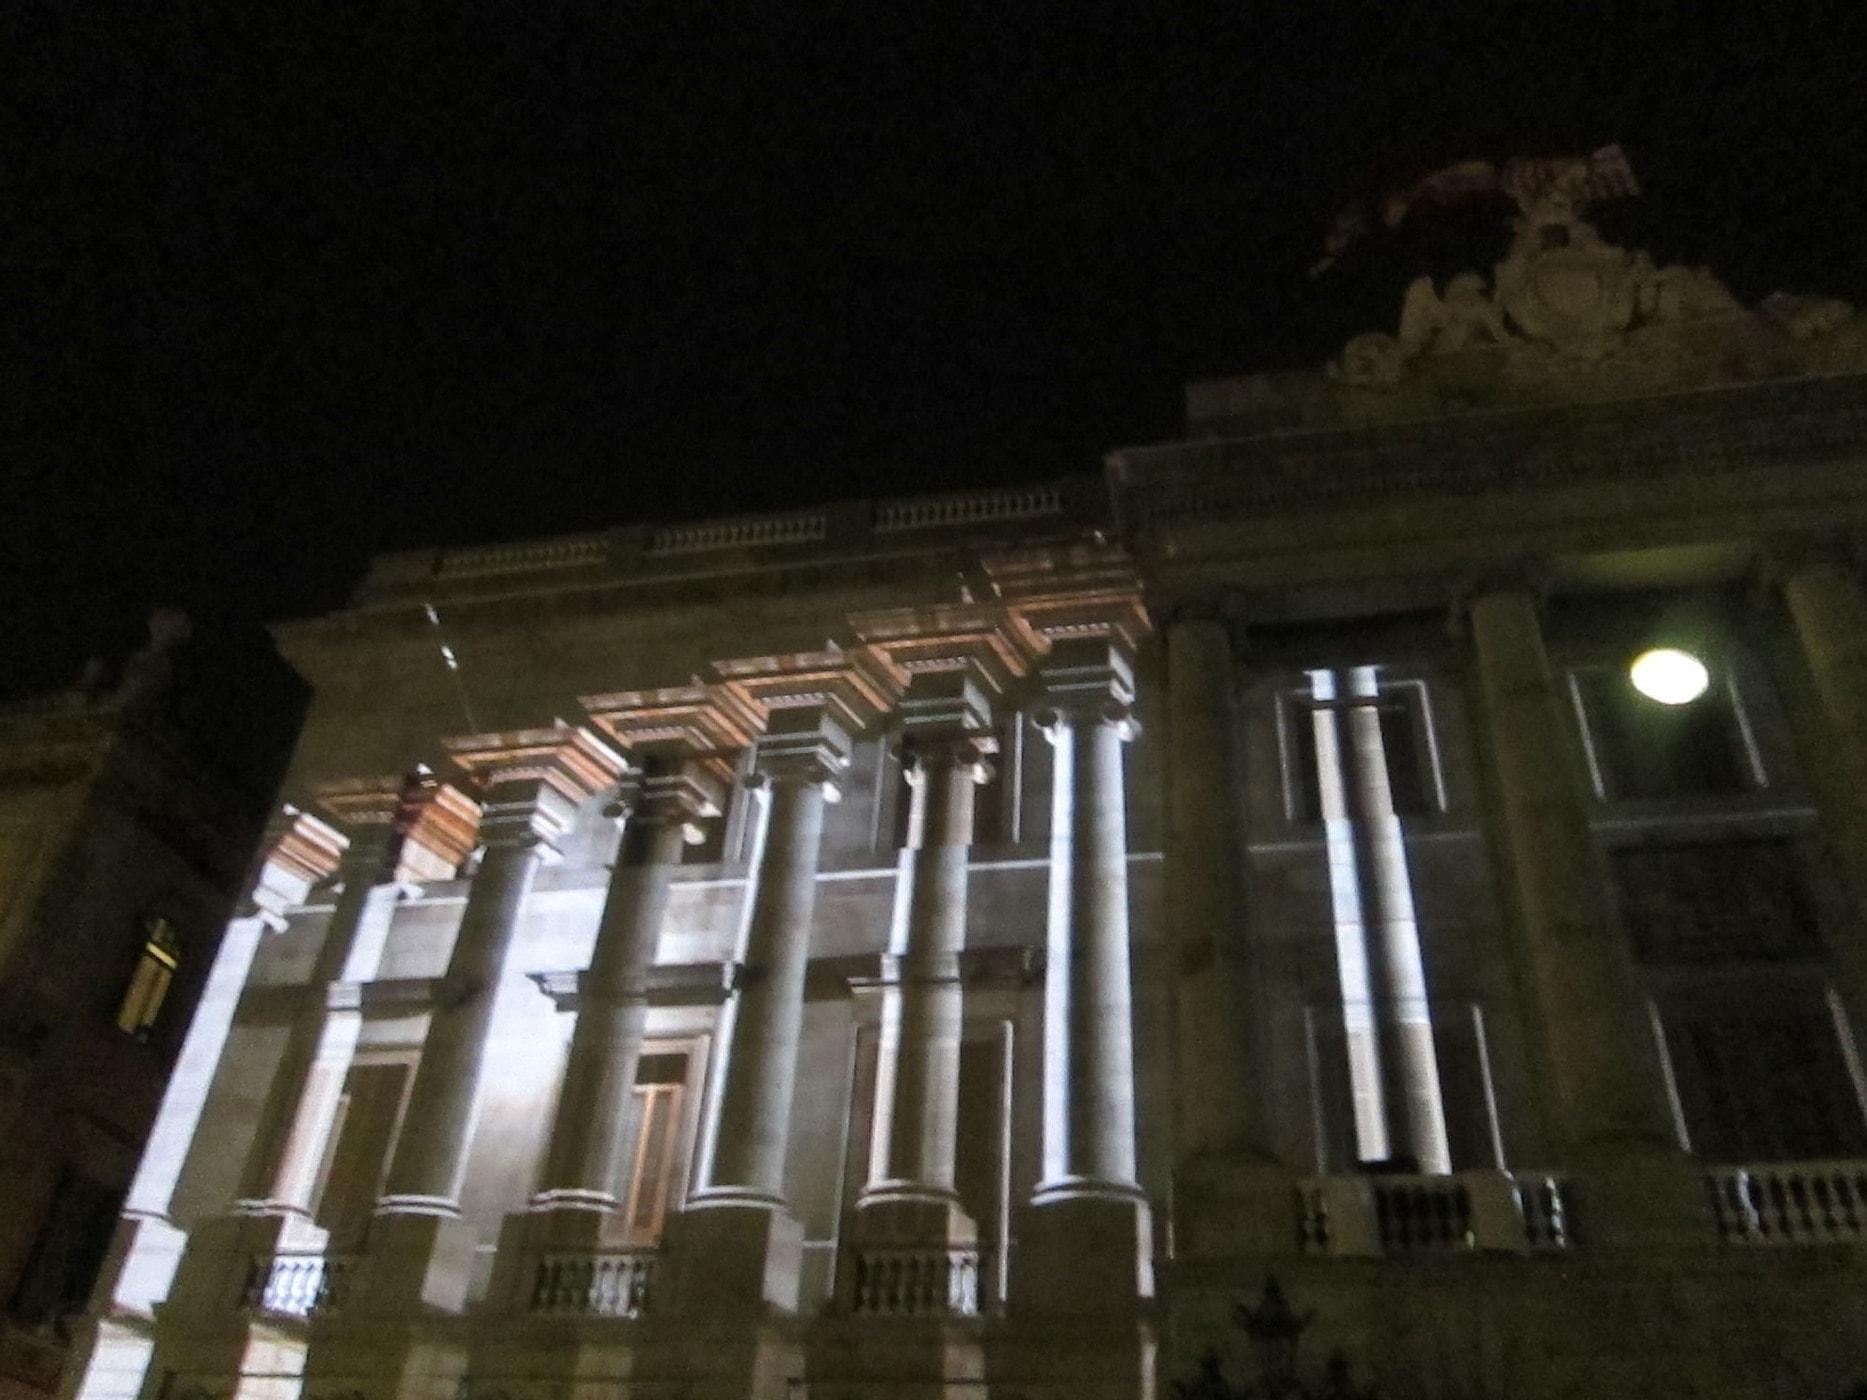 Building projections at La Mercè Festival in Barcelona, Spain